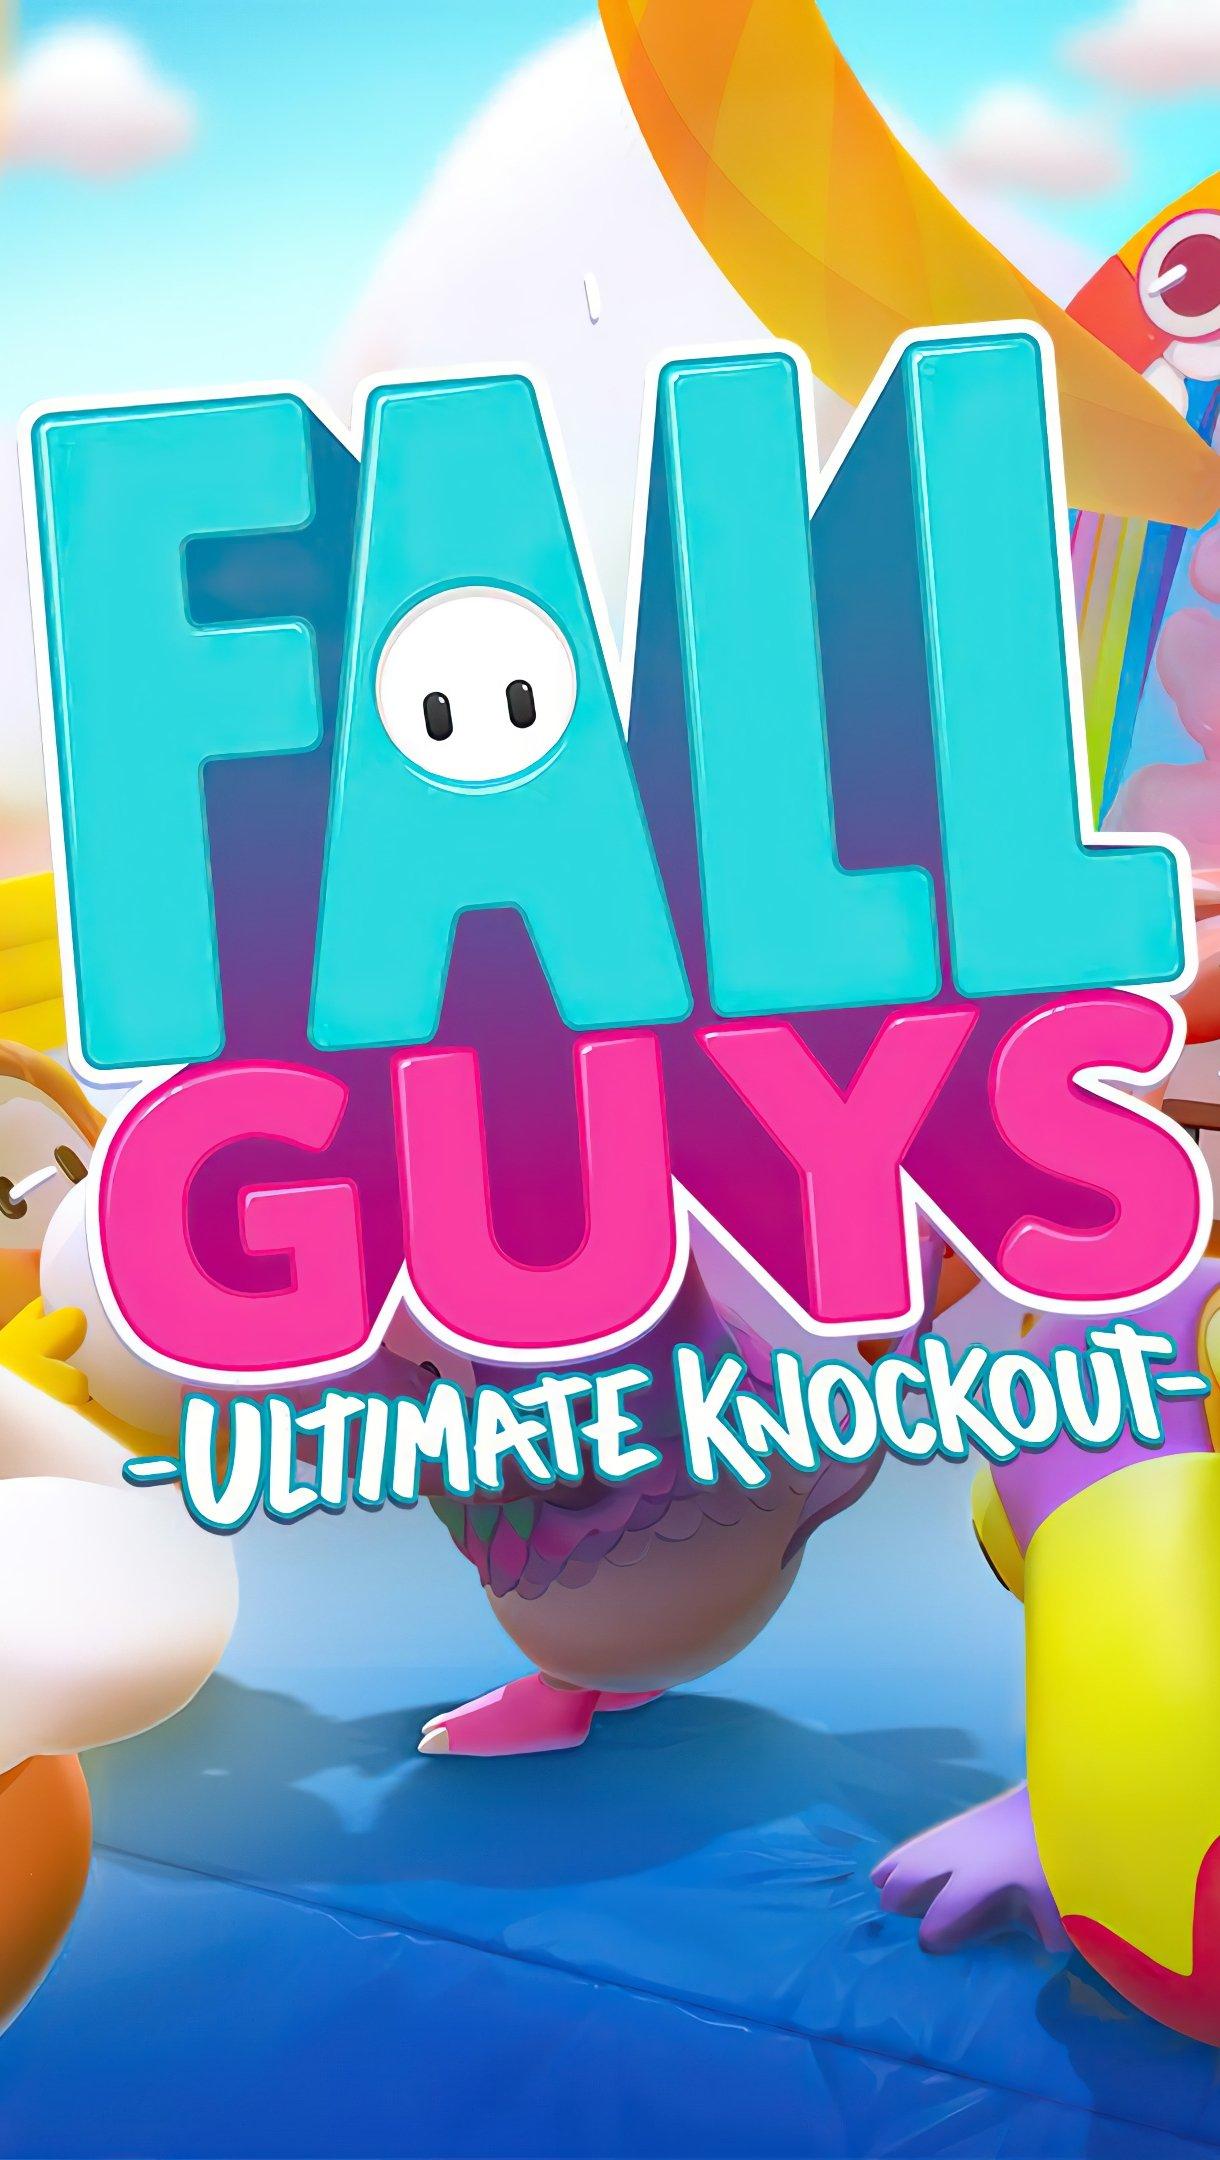 Fall Guys Ultimate Knockout Wallpaper 4k Ultra Hd Id 6204